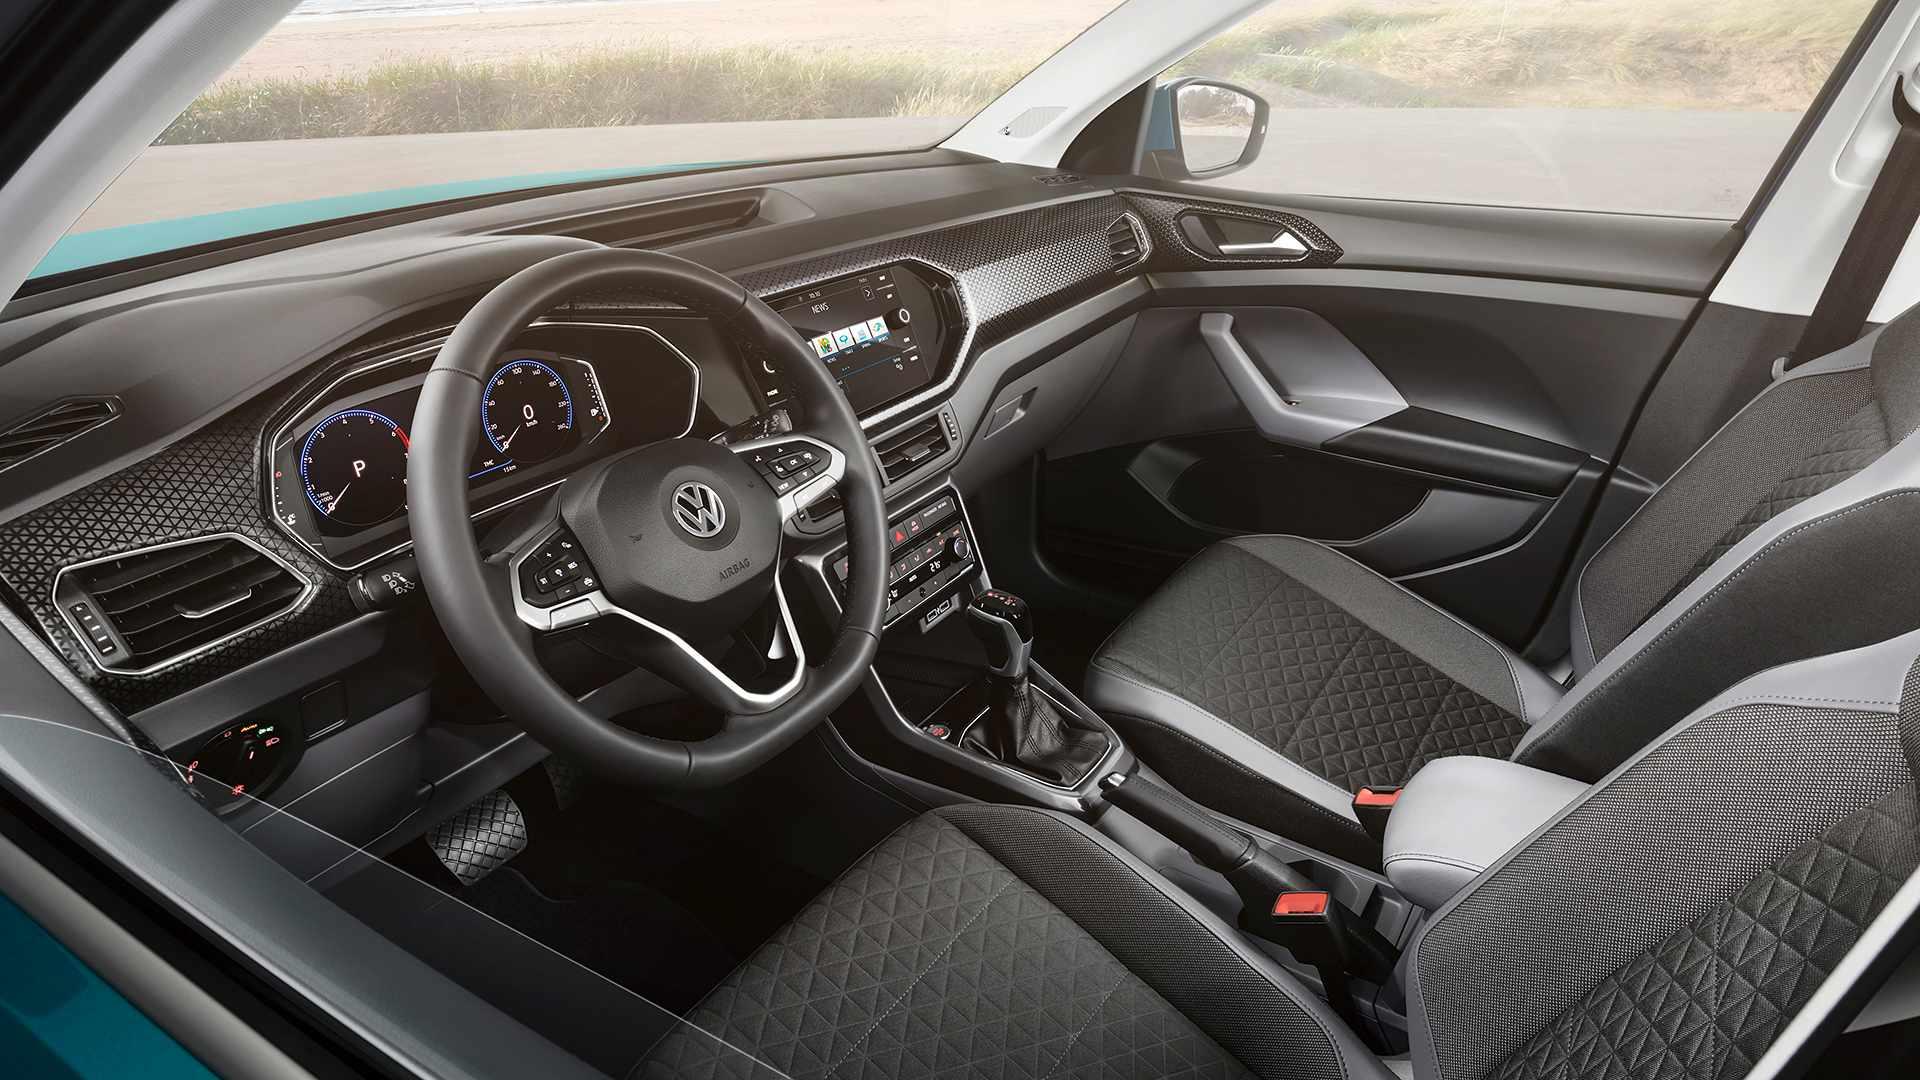 Volkswagen T Cross Finally Goes Official